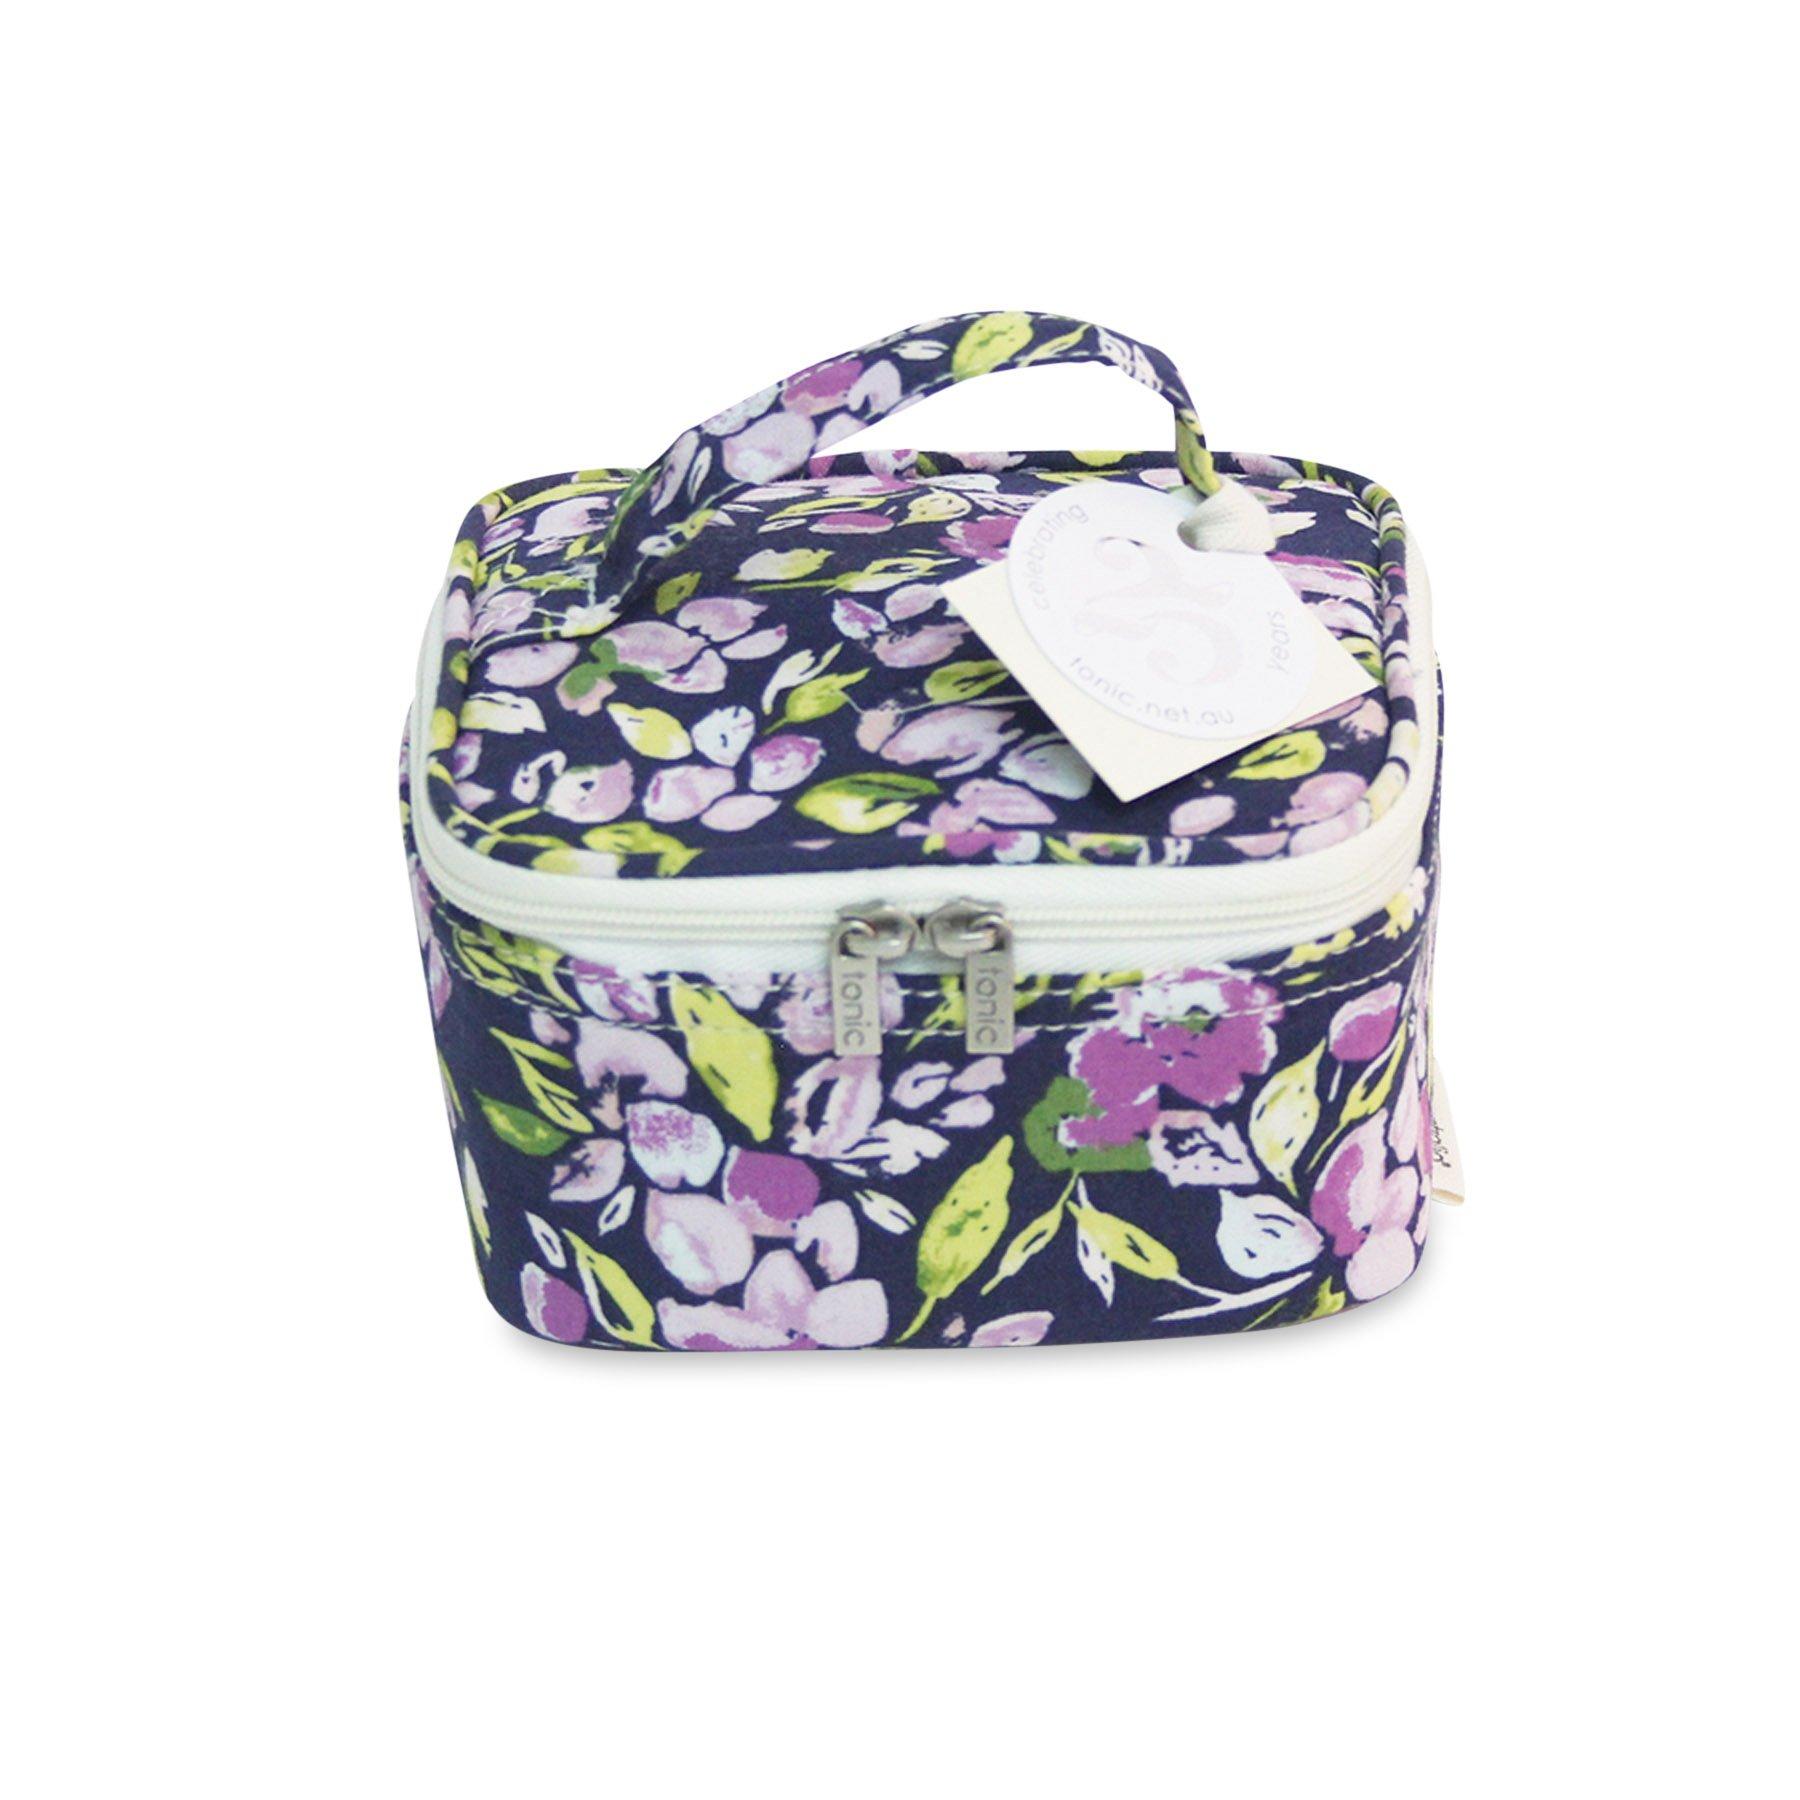 Tonic Australia The Cube Jewelery Holder Mini Bell